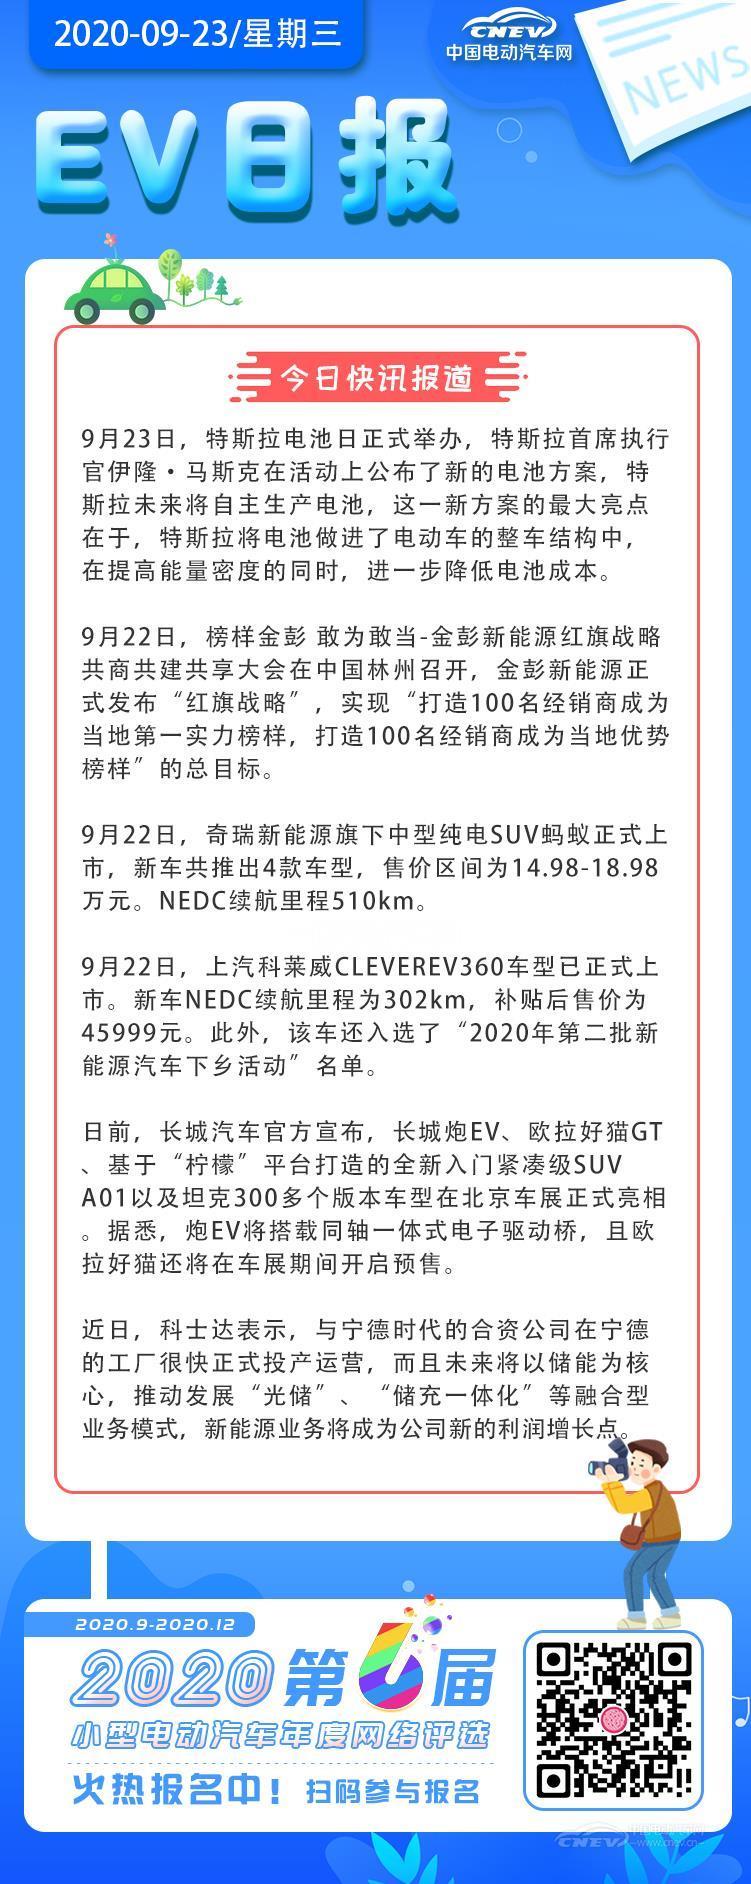 "EV日报 丨 特斯拉电池日正式举办,金彭新能源正式发布""红旗战略""……"